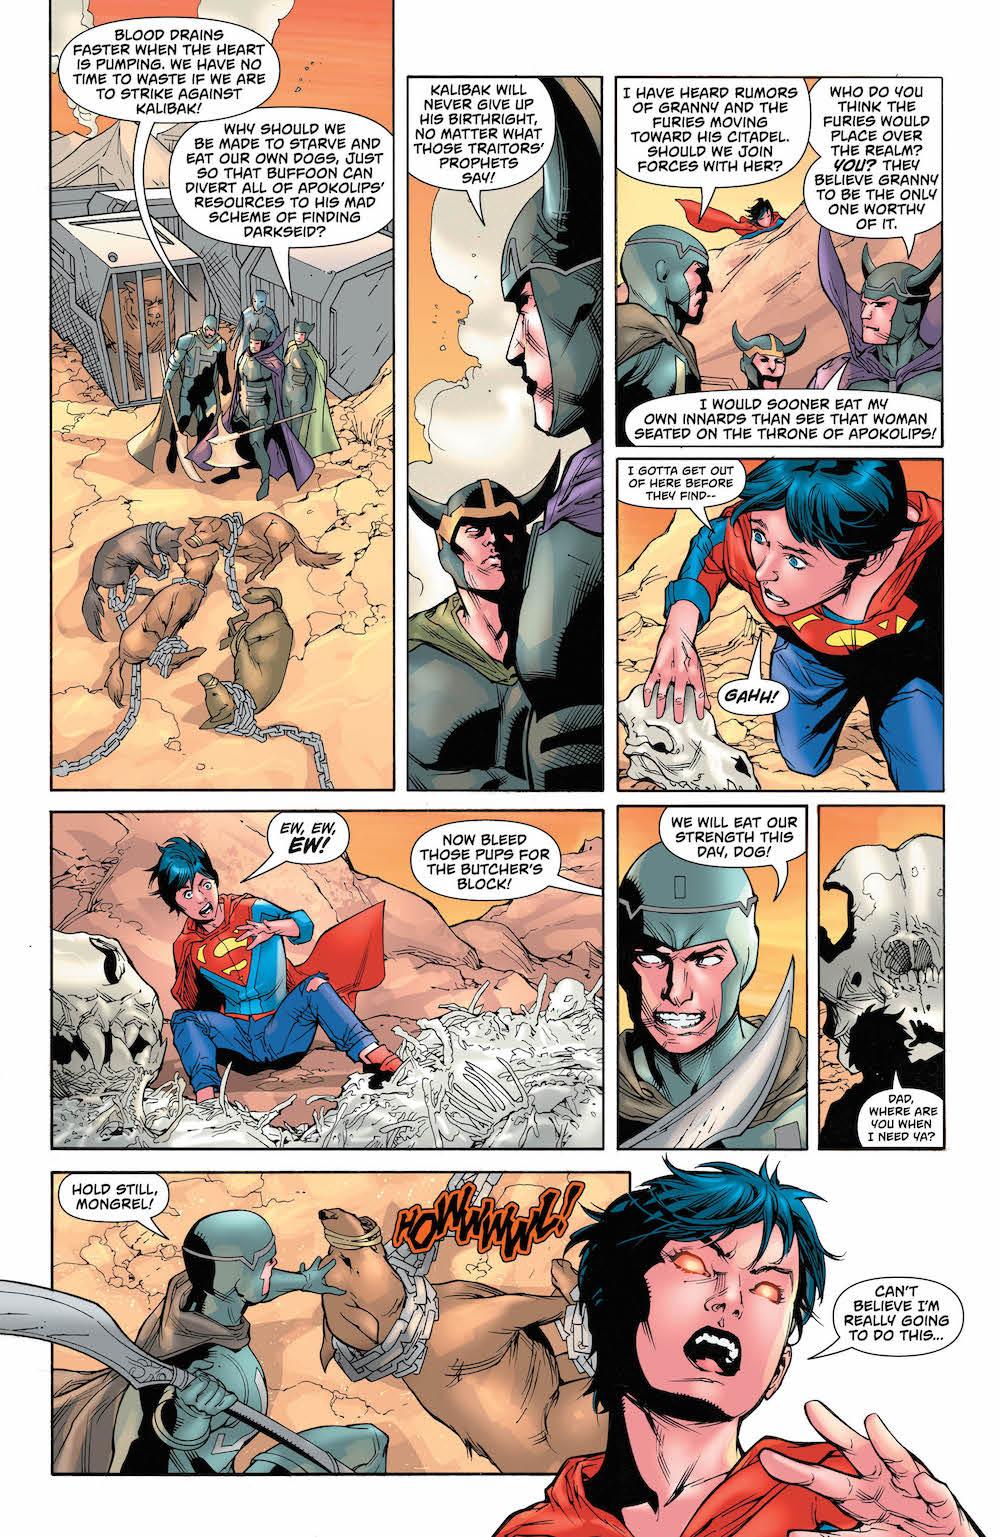 Jon Kent, Superman #35, 2017